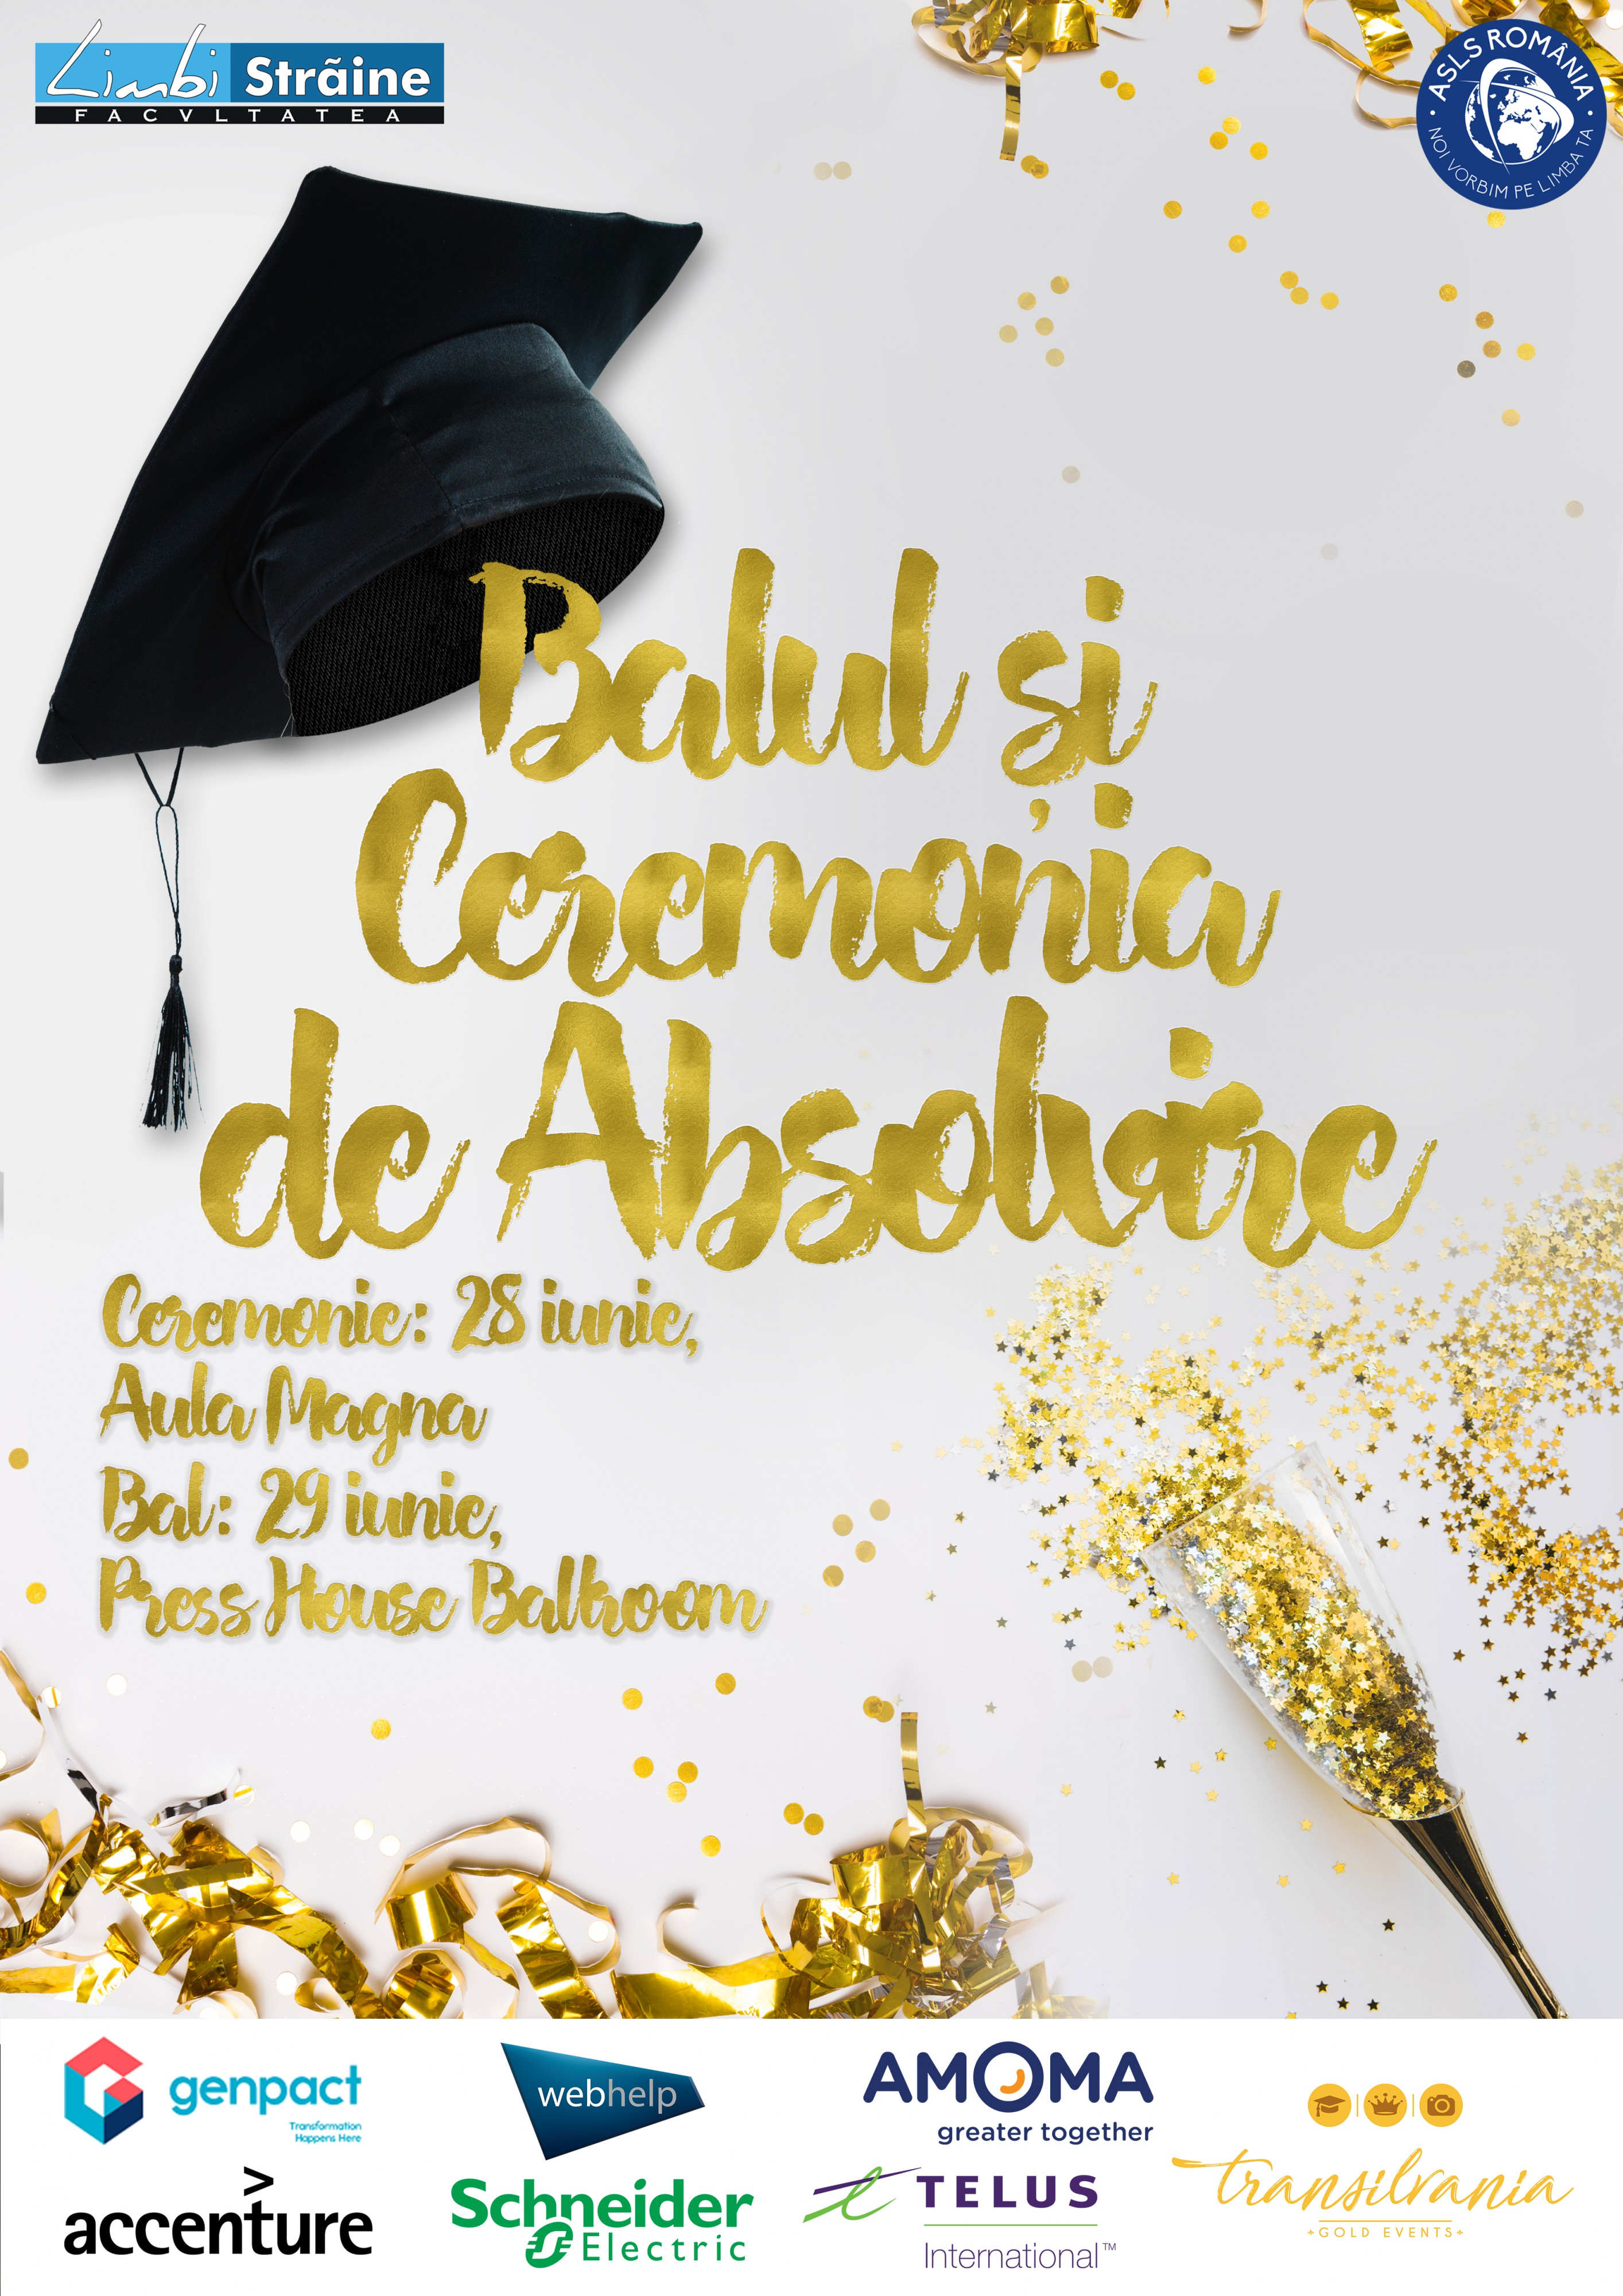 Balul și Ceremonia de Absolvire 2018